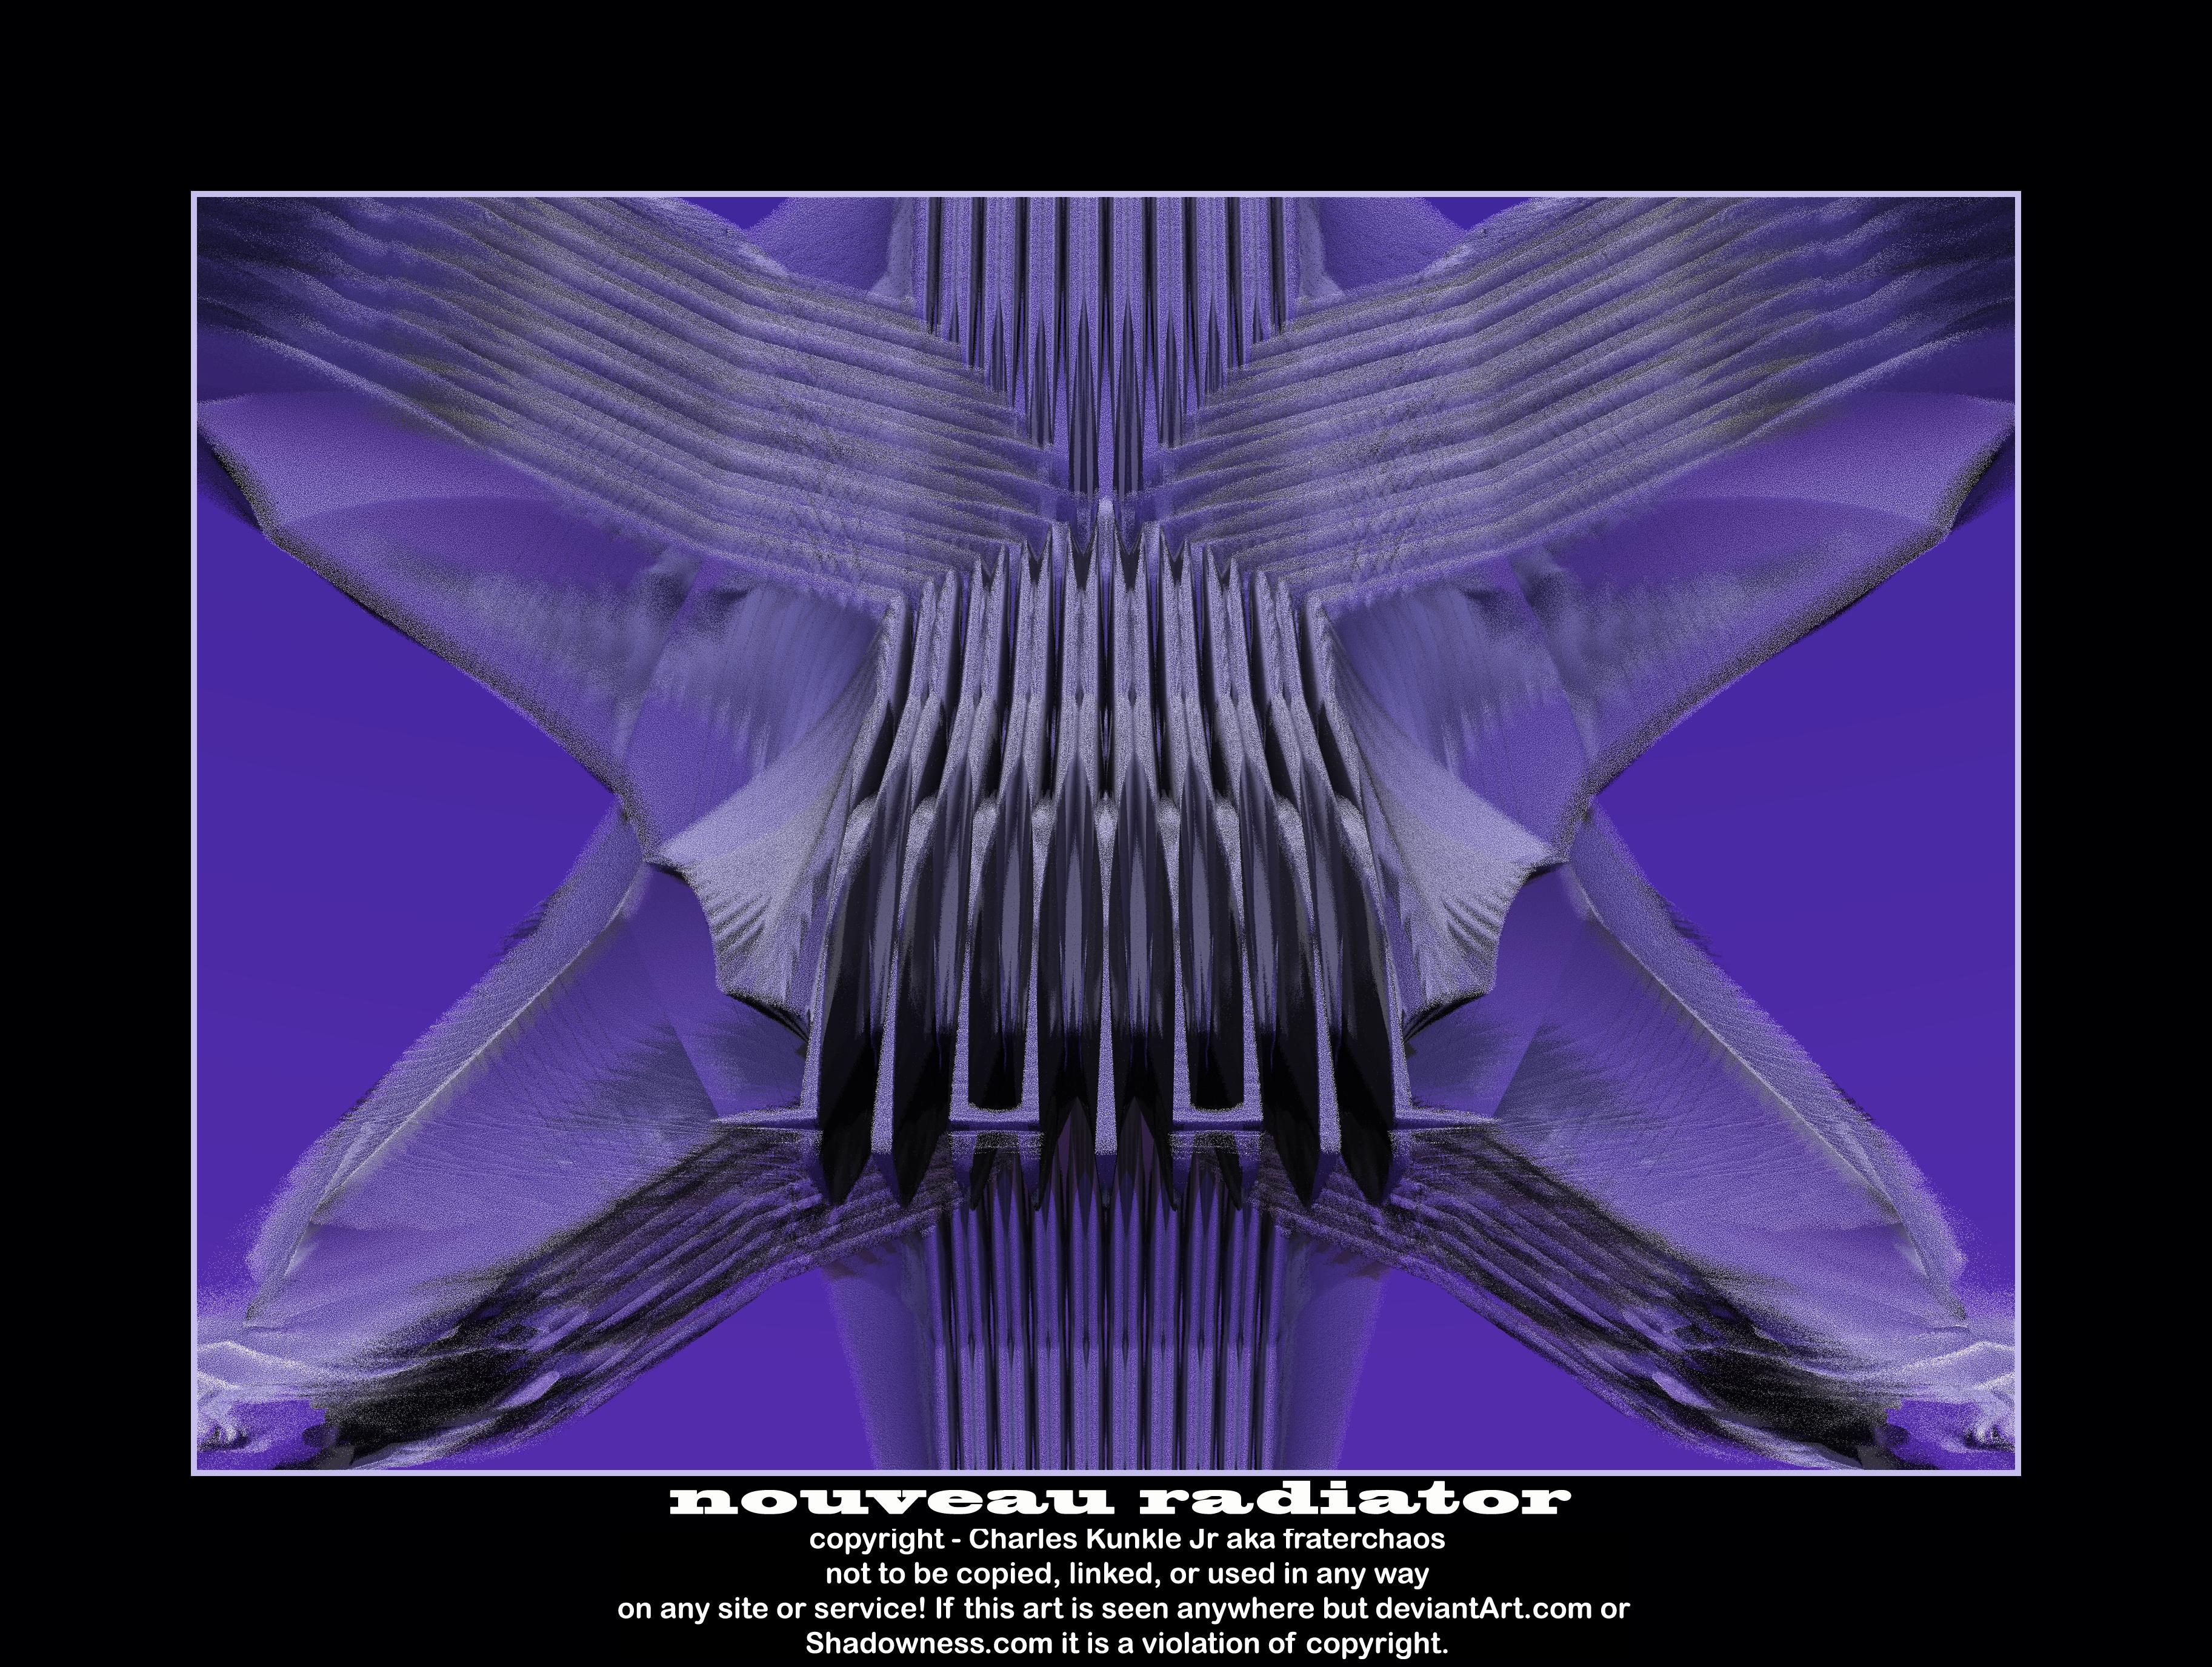 nouveau radiattor by fraterchaos